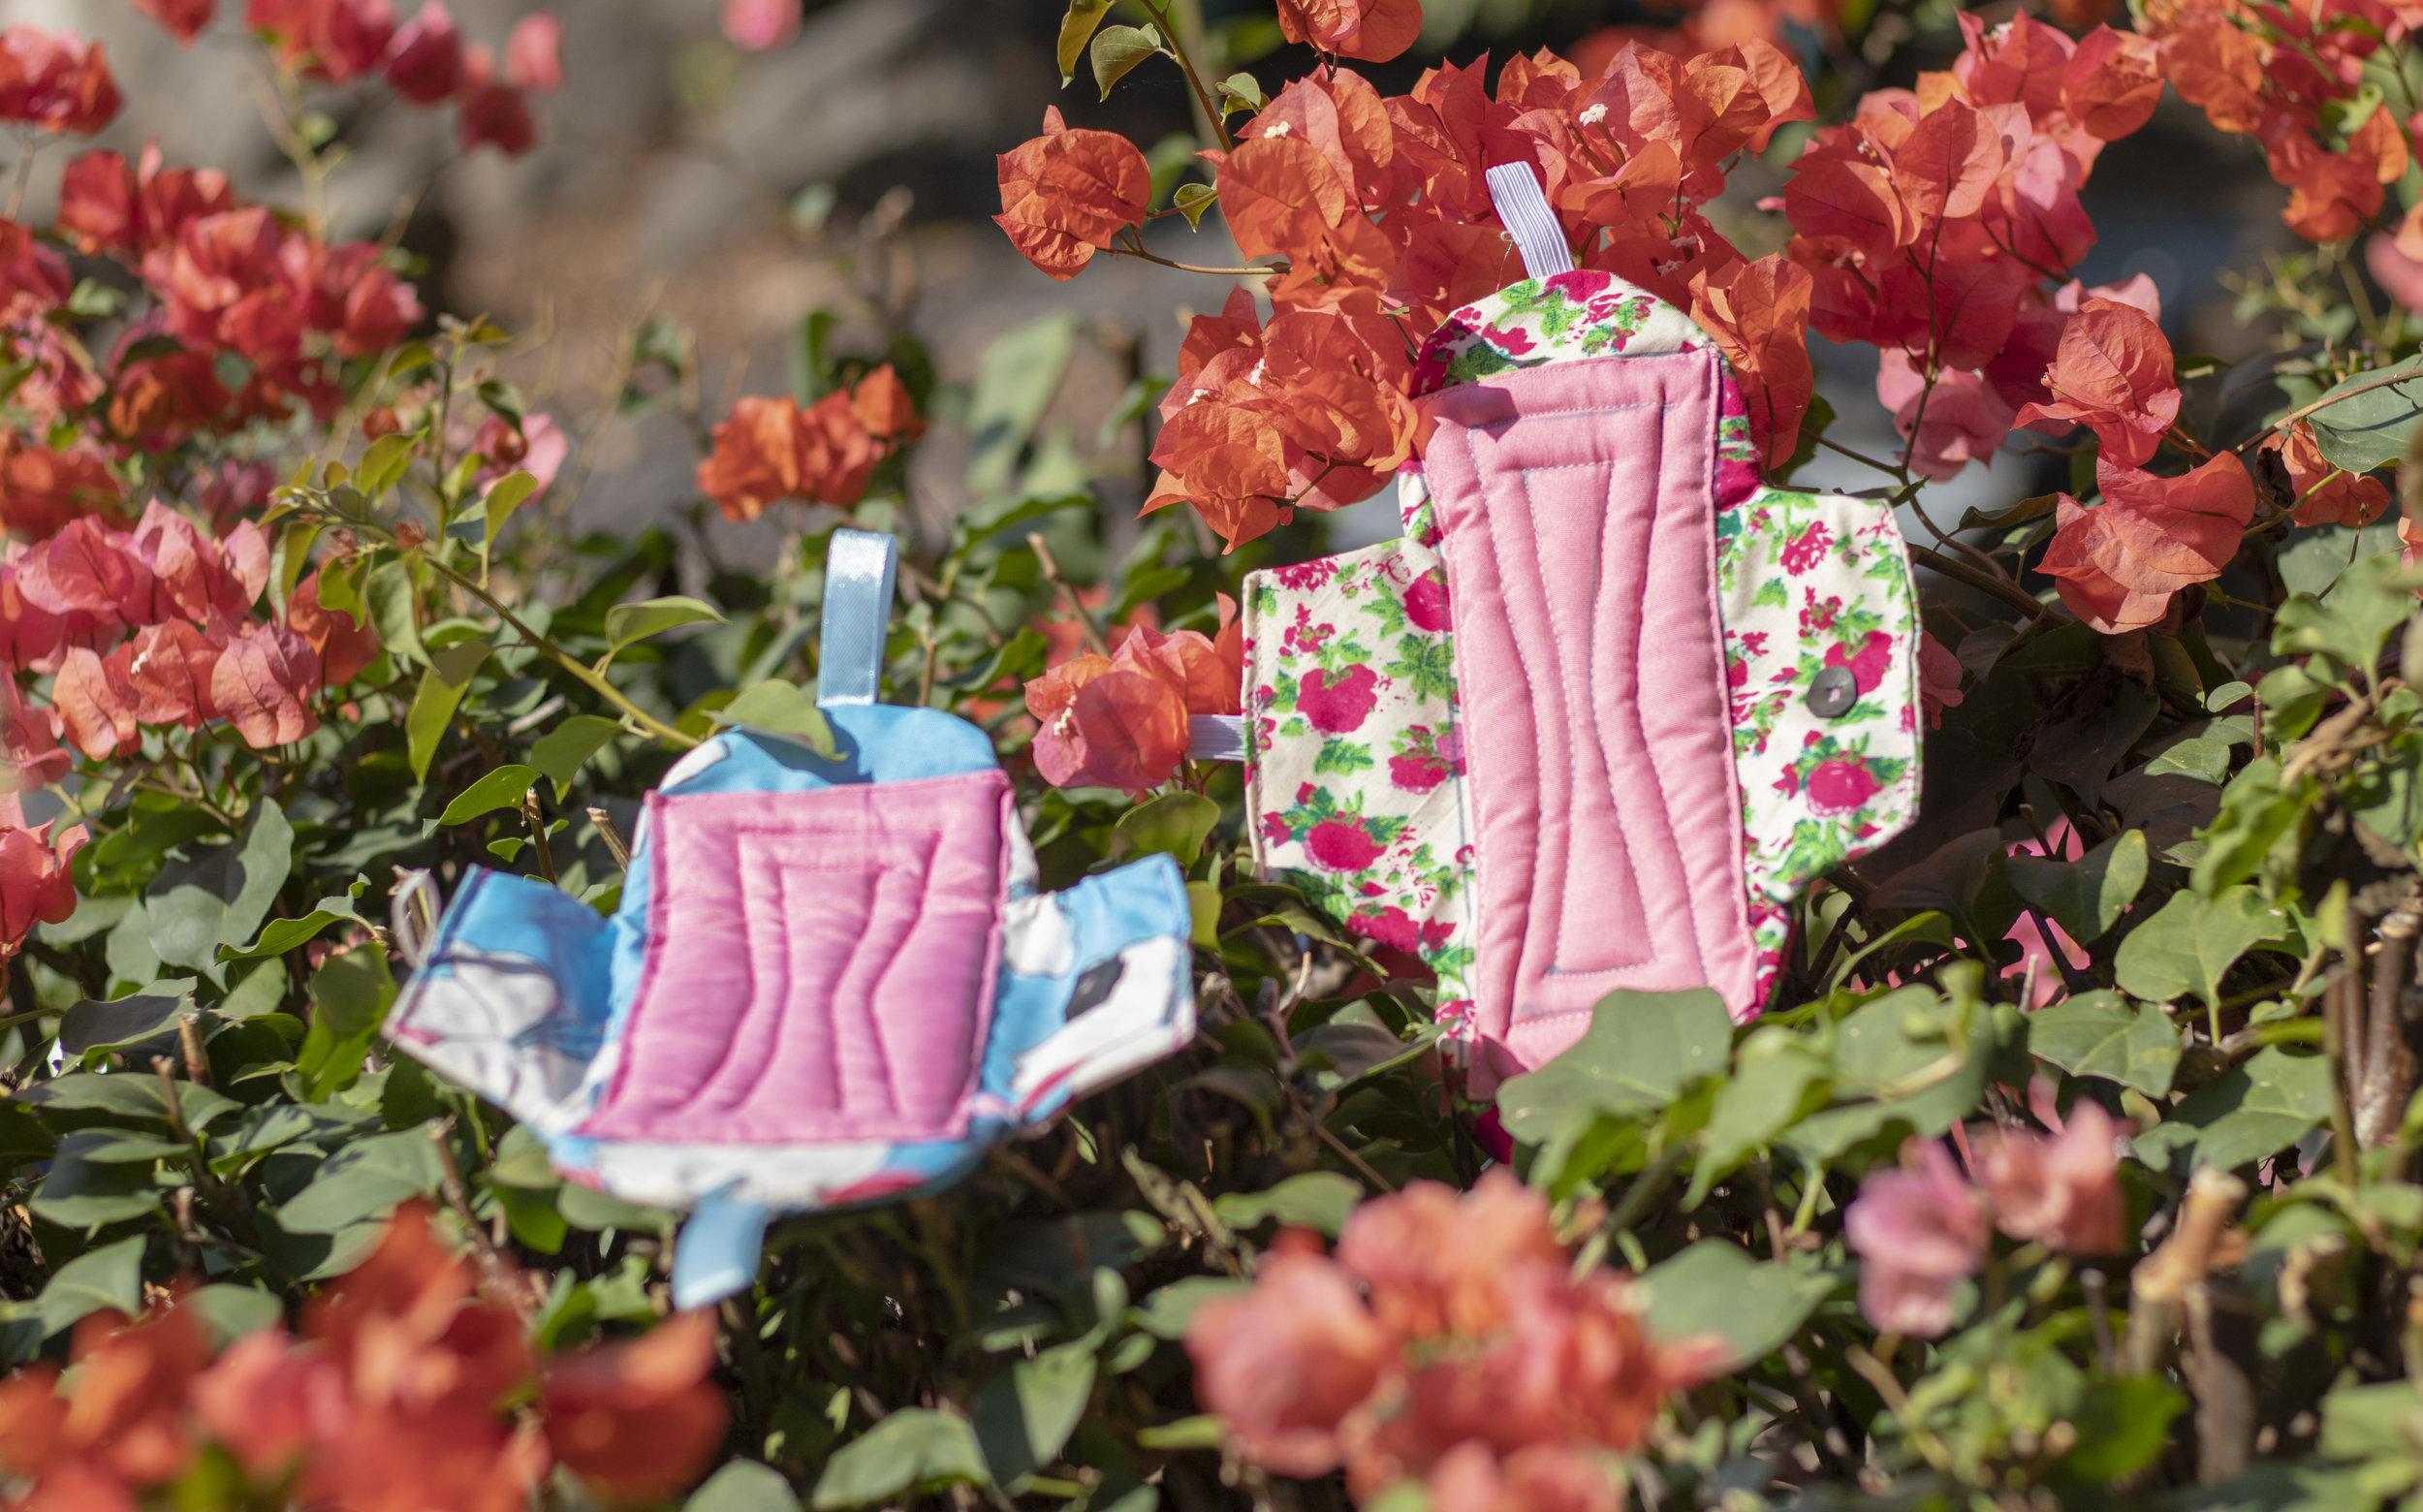 Reusable sanitary pads flowers.jpg